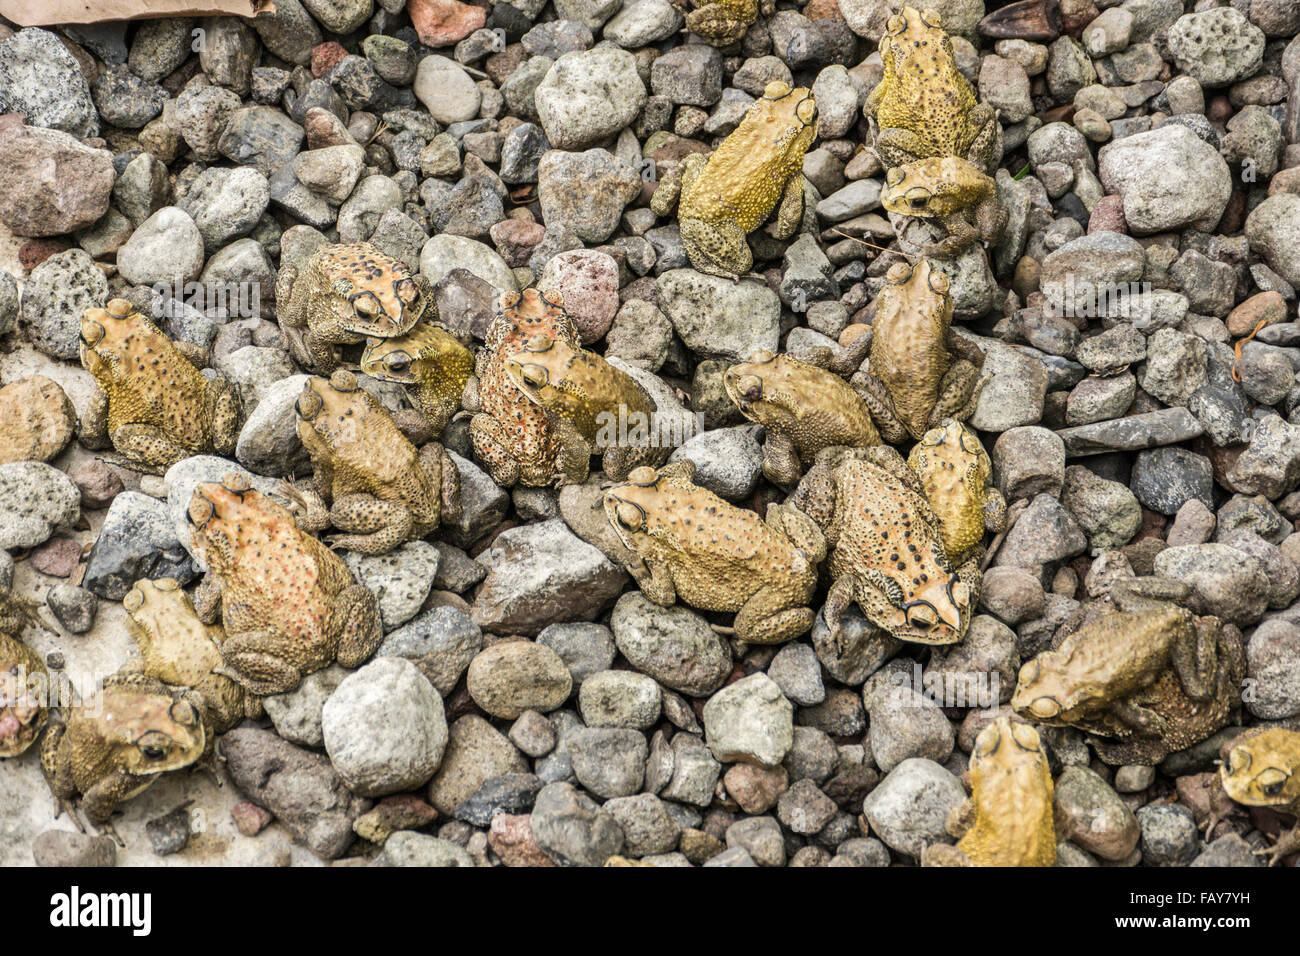 Indonesia, Tejakula, Bali, mating frogs - Stock Image